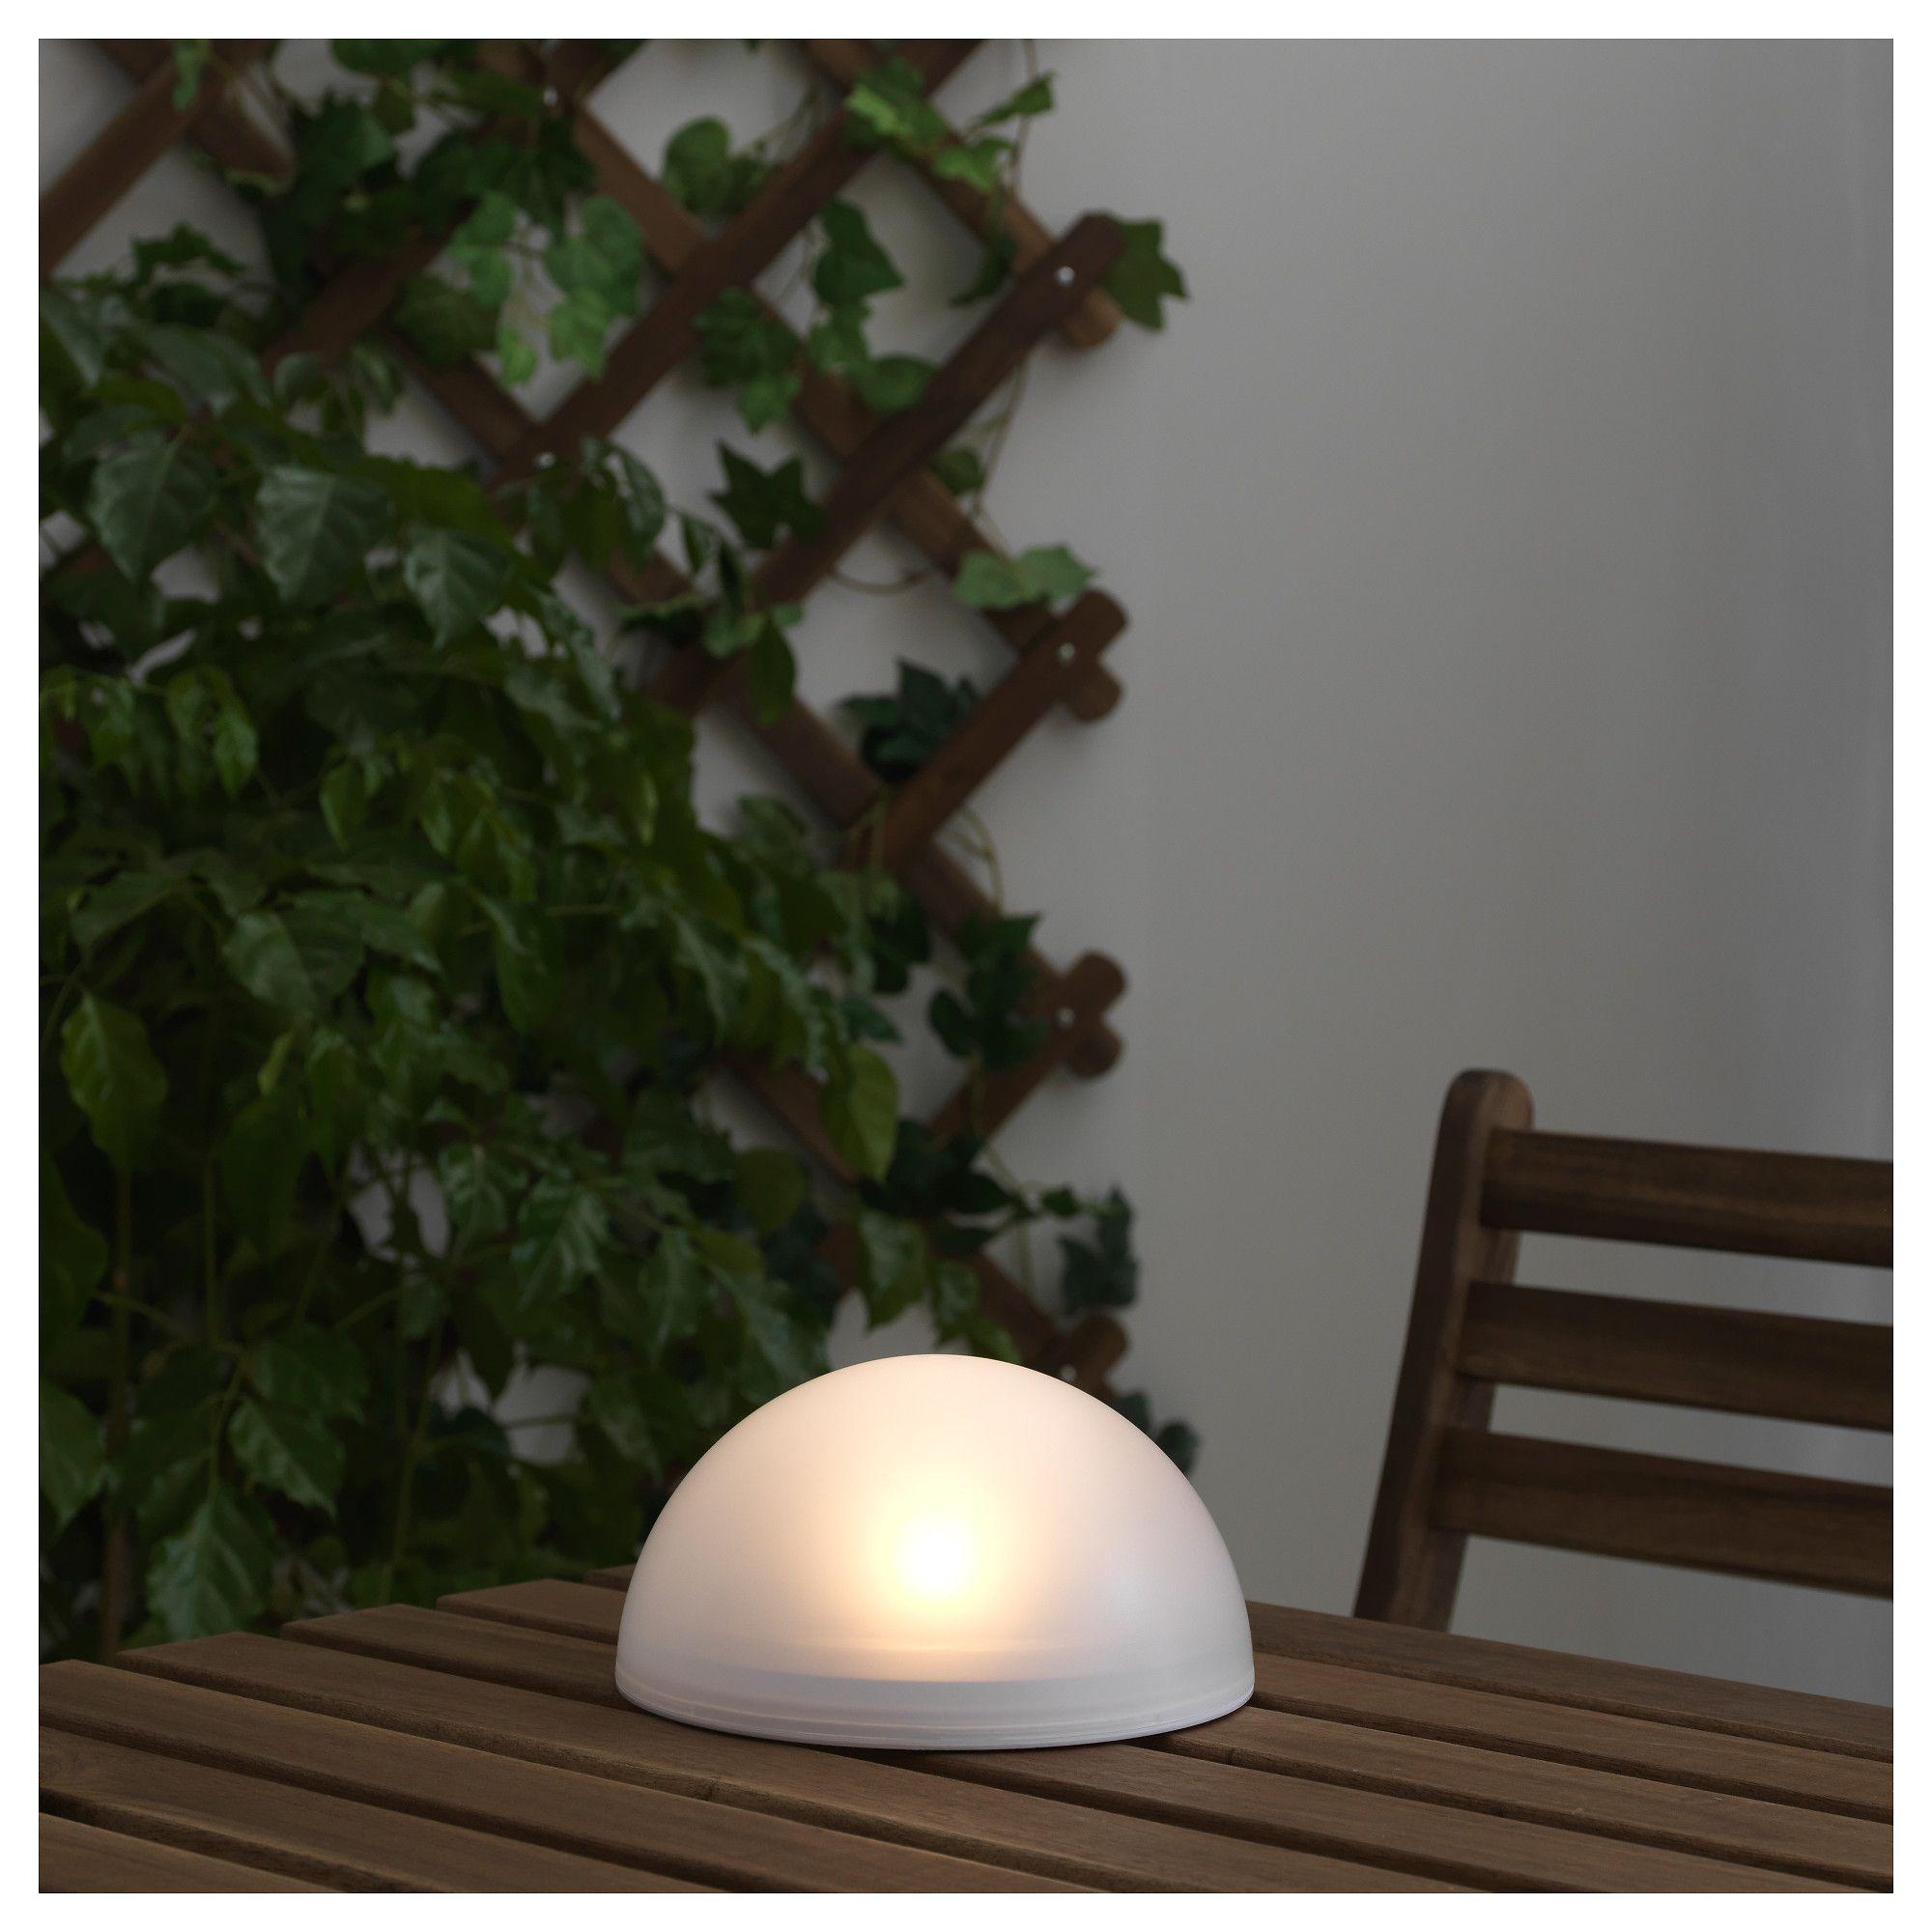 Luminaire Solaire Ikea Lampe Solaire Jardin Impressionnant 20